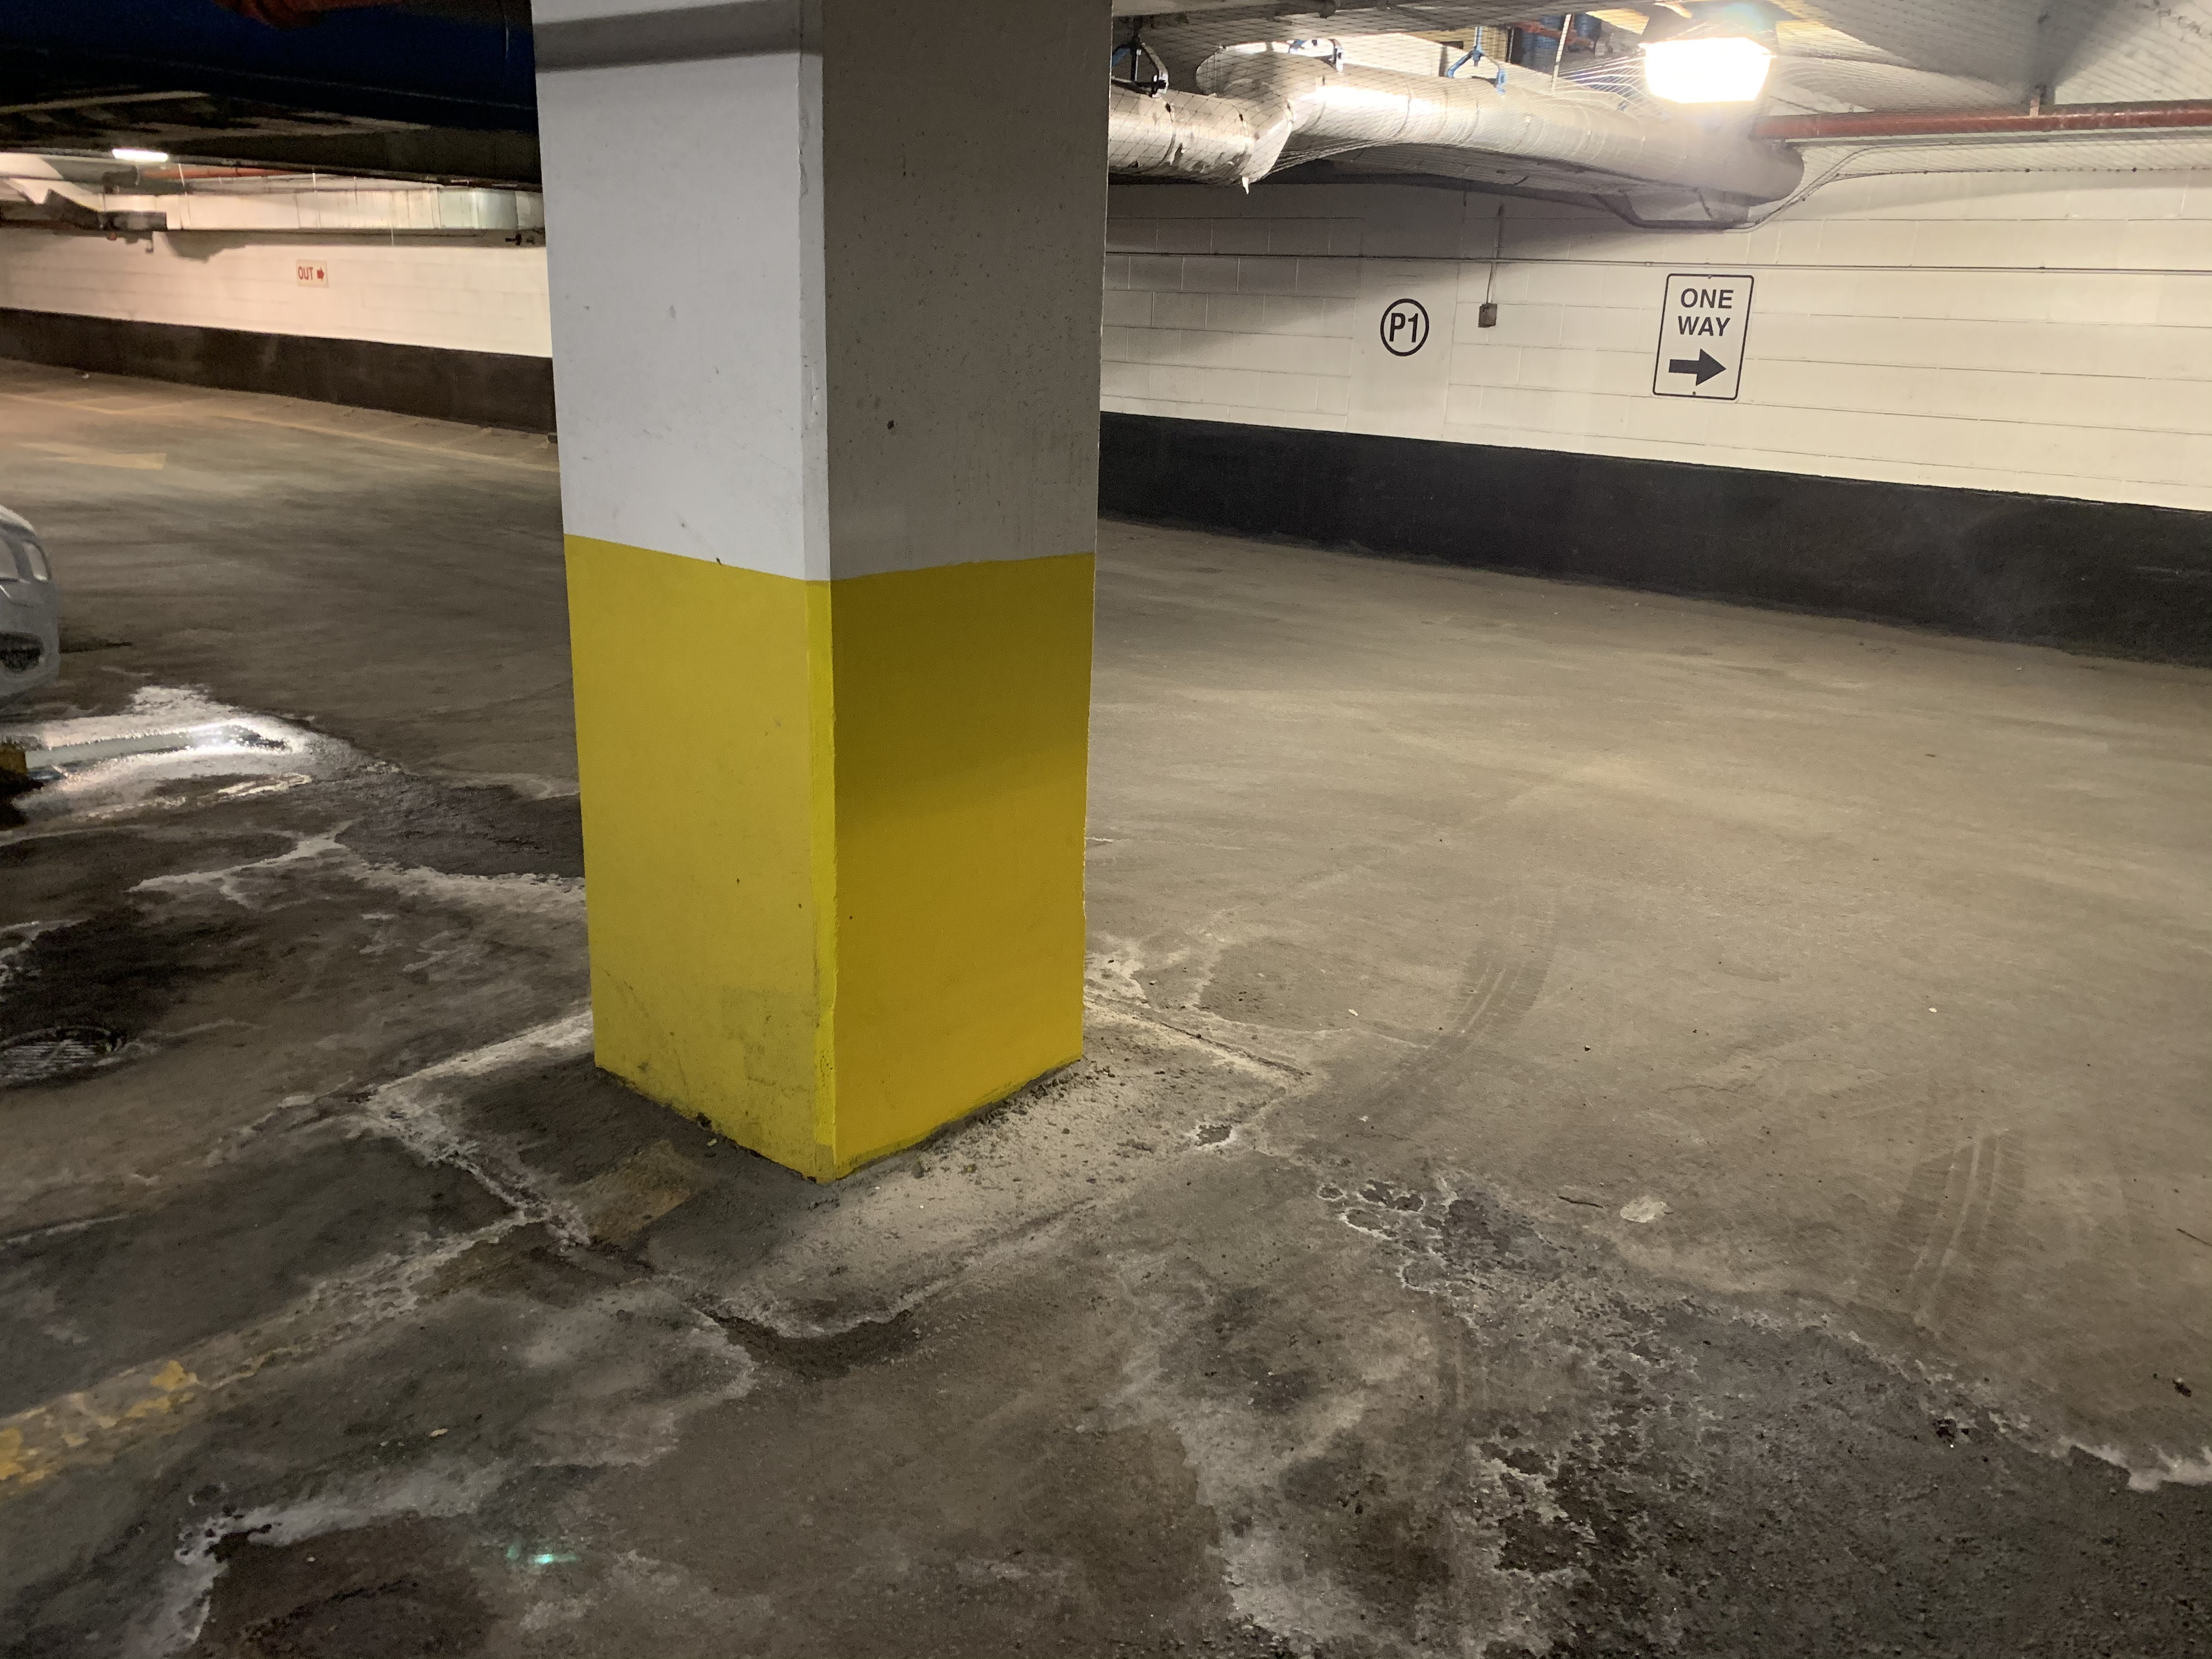 CAMH Parking Garage